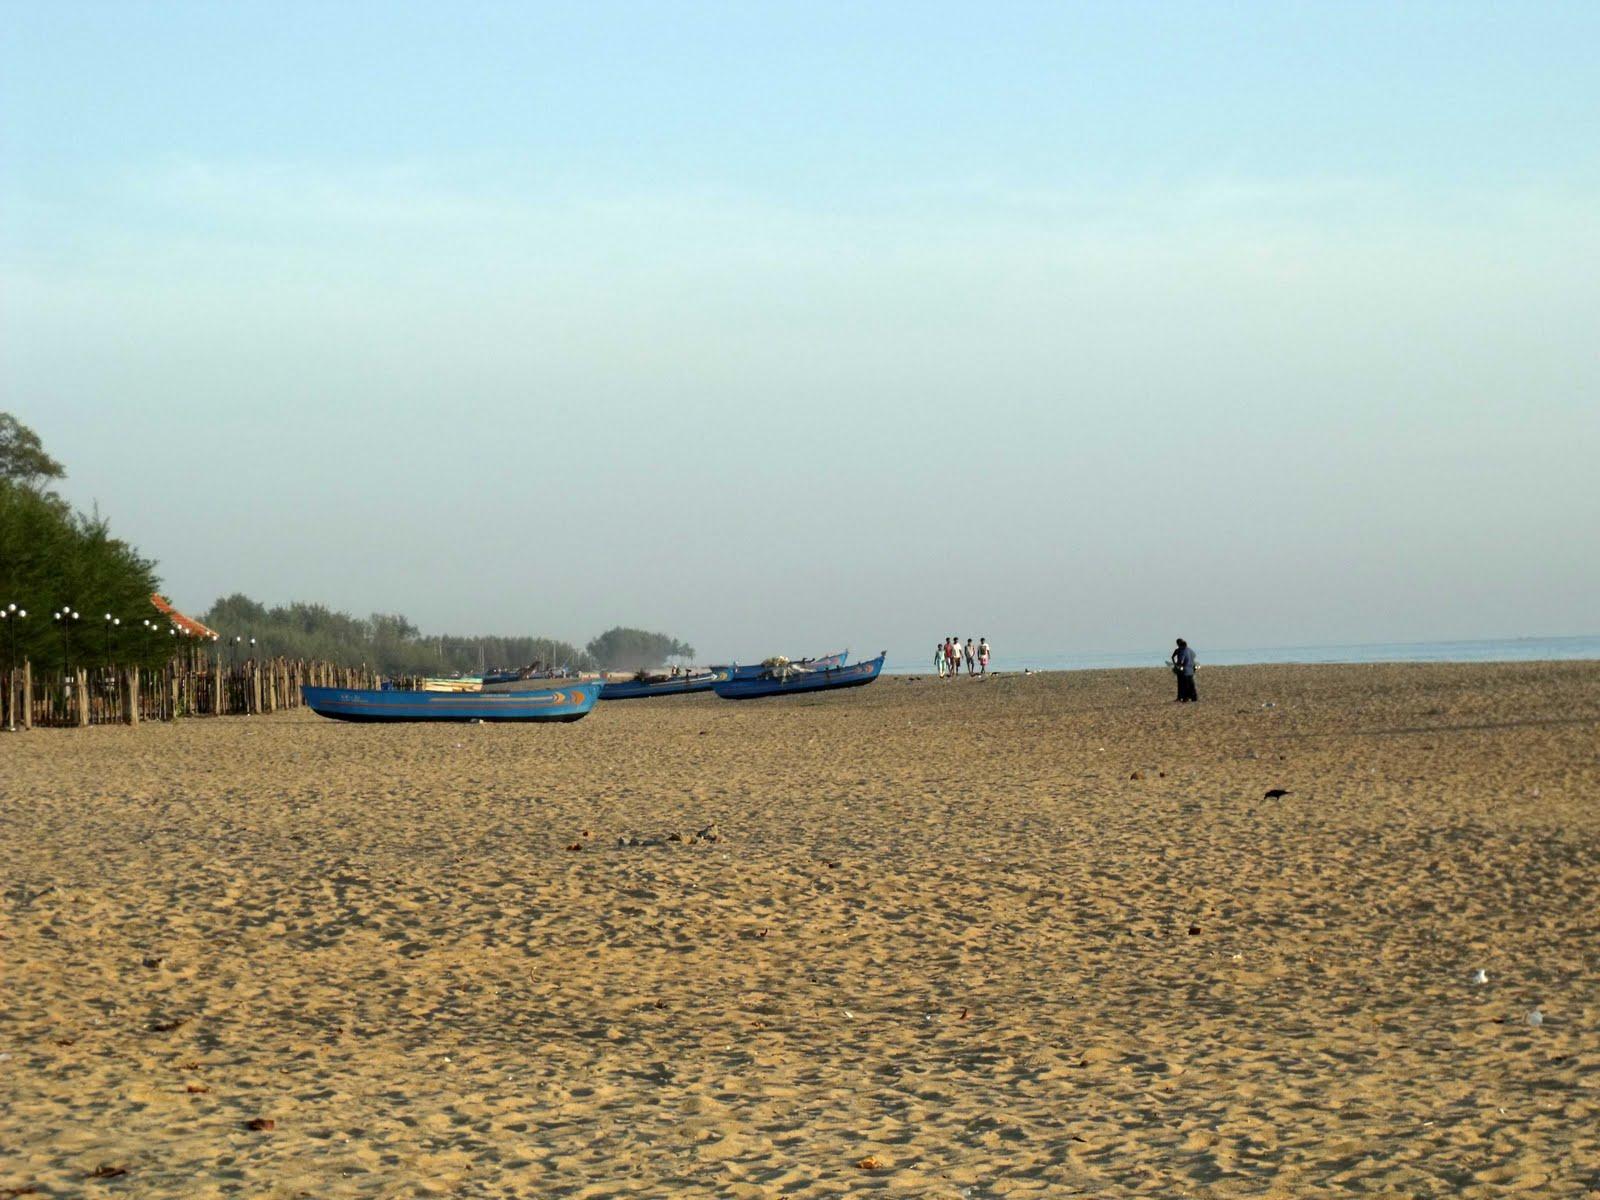 Batticaloa Sri Lanka  city photos : ... of Sri Lanka on blogspot.com: Kallady beach, Batticaloa, Sri Lanka